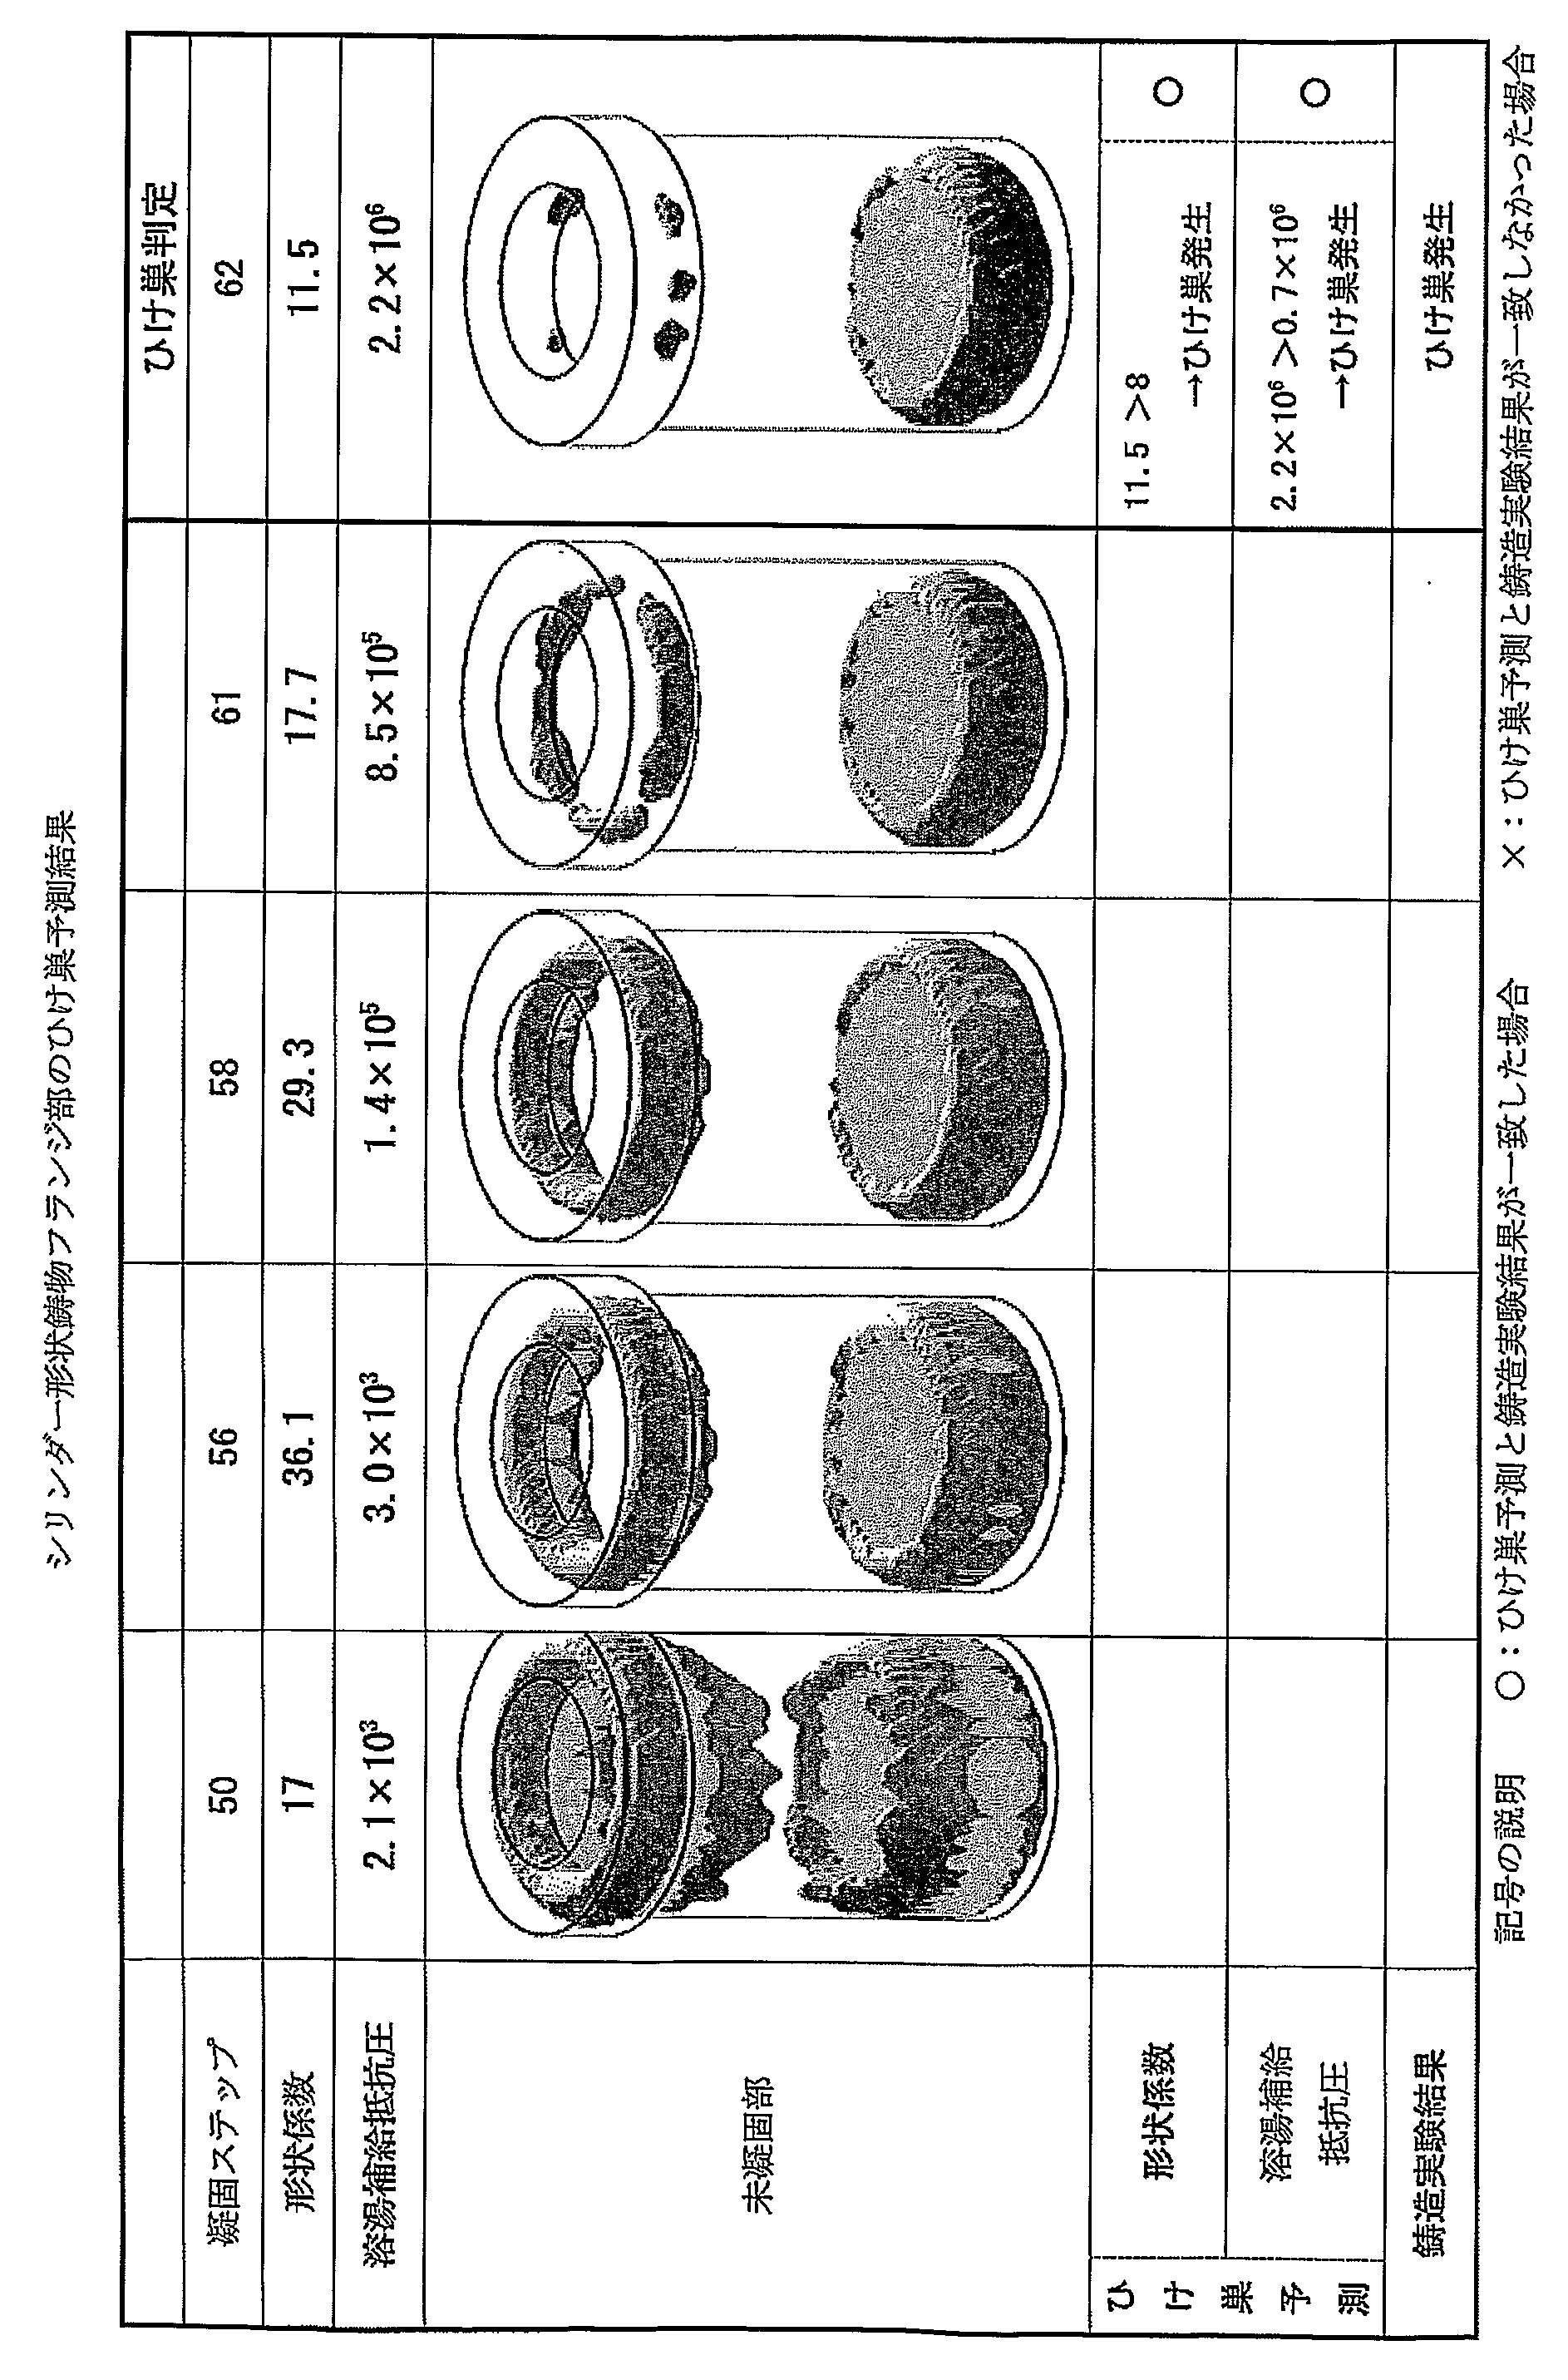 WO2009133602A1 - 鋳鉄鋳物の引け巣の予測および防止方法         - Google PatentsFamily